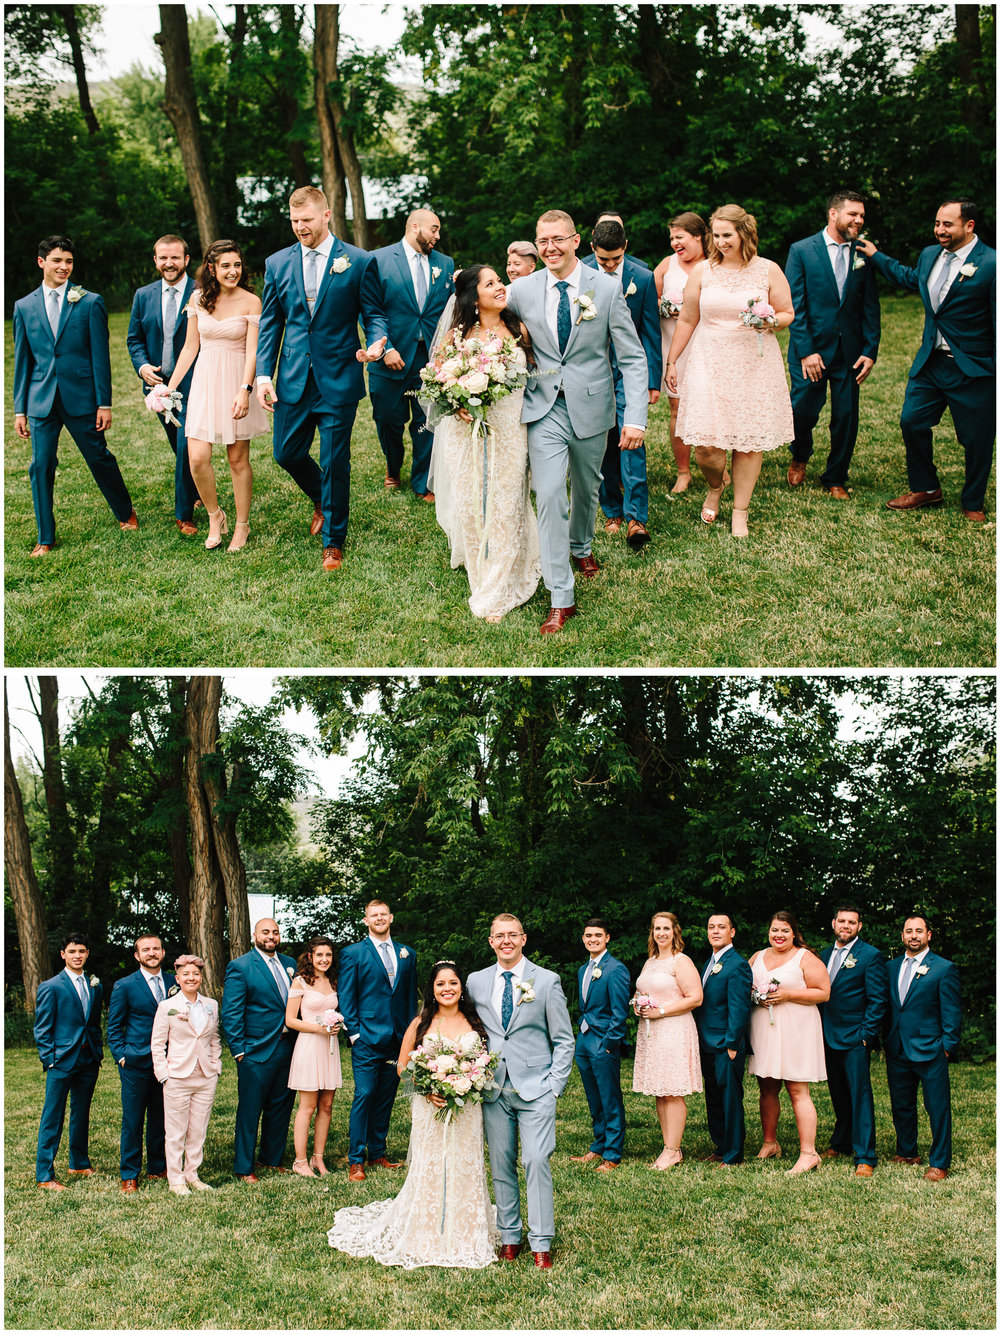 lyons_farmette_wedding_37.jpg